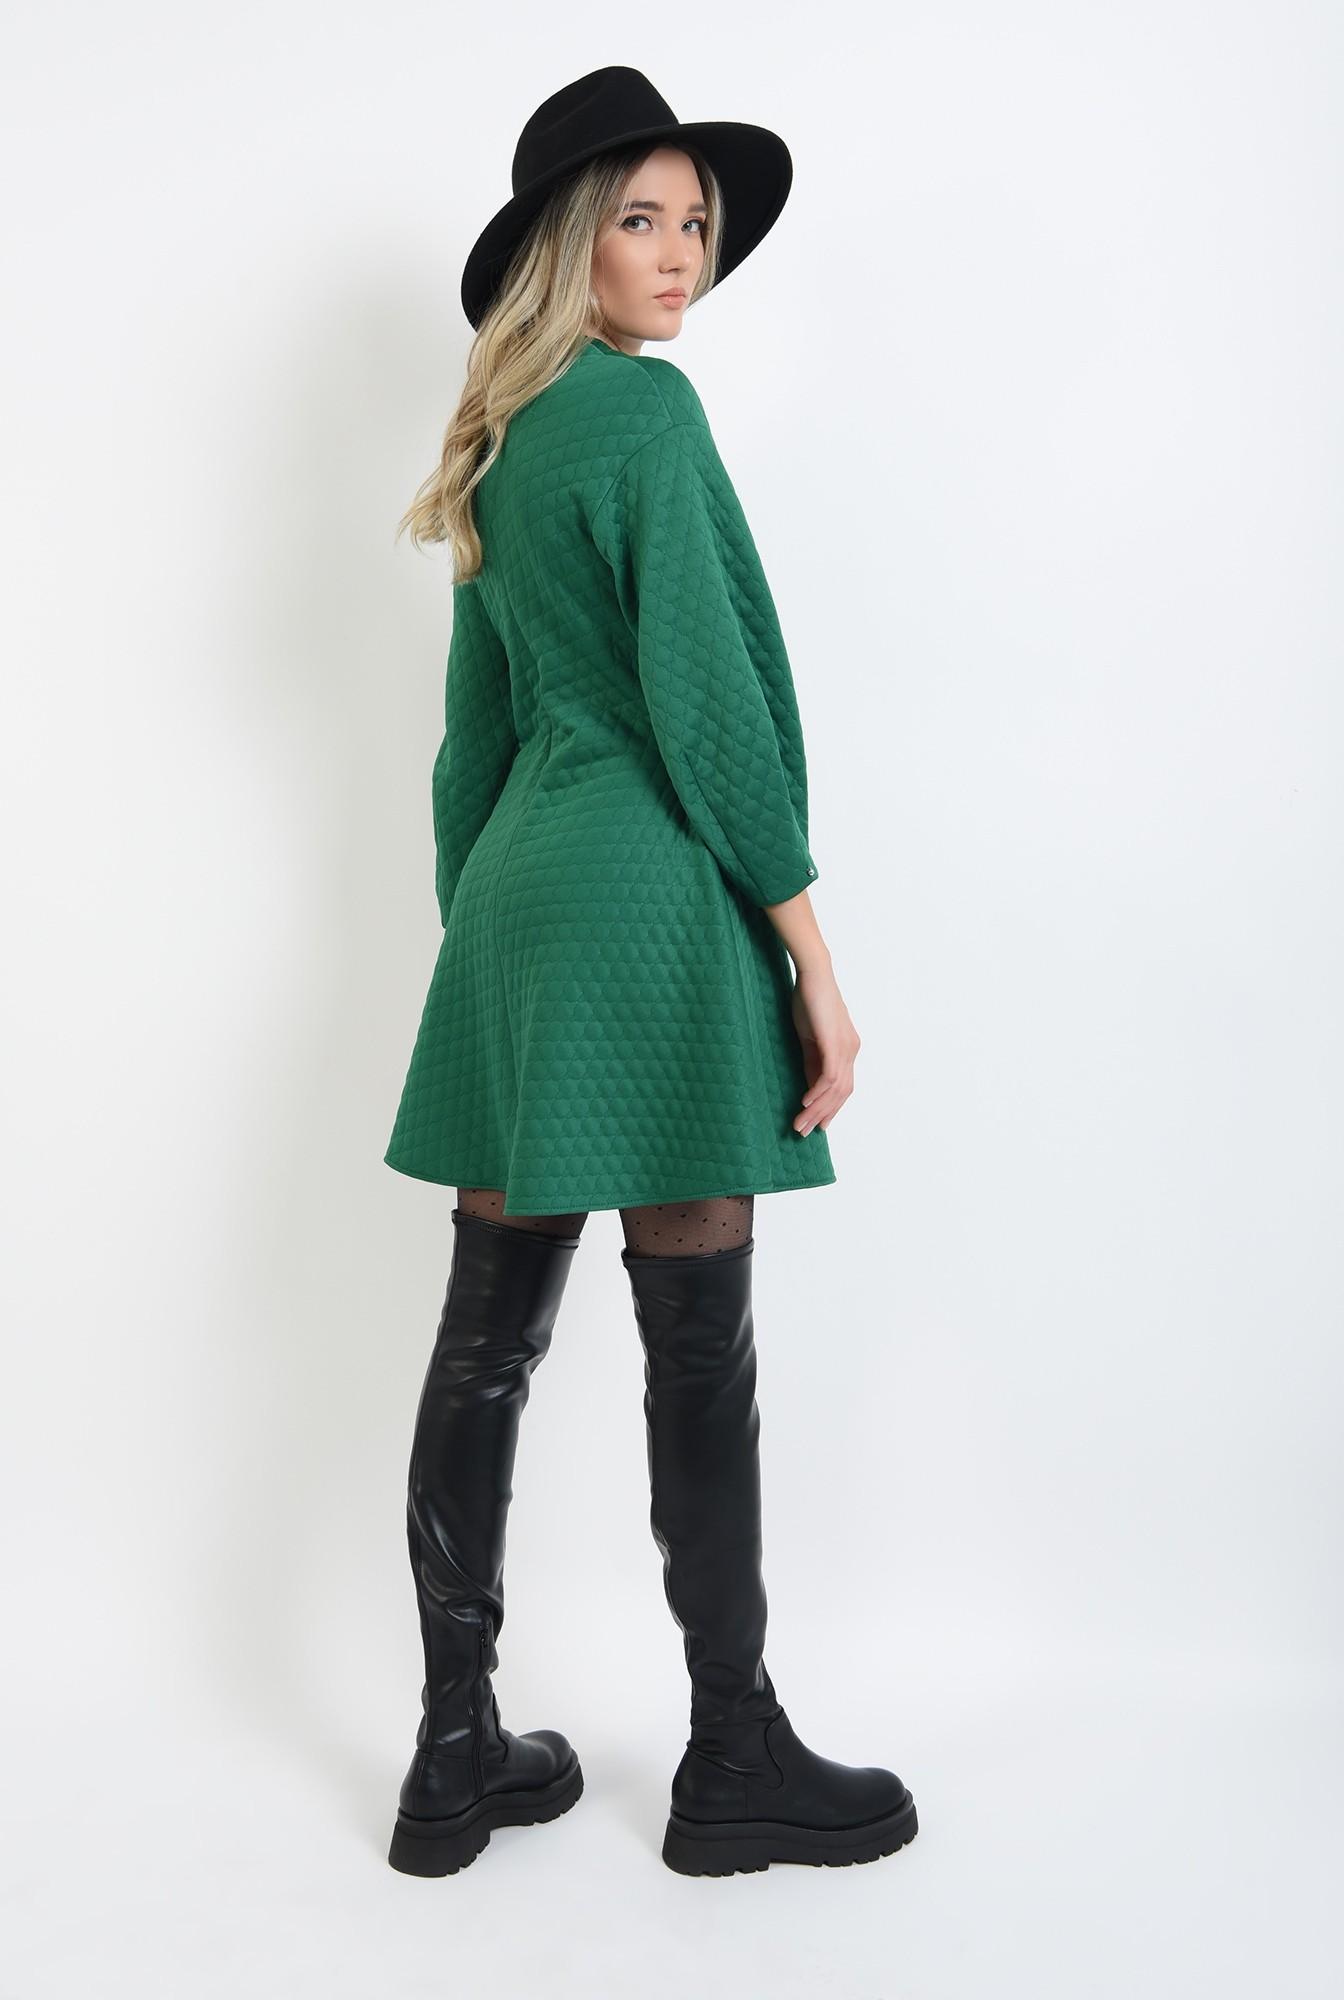 2 - rochie din material matlasat, verde, scurta, evazata